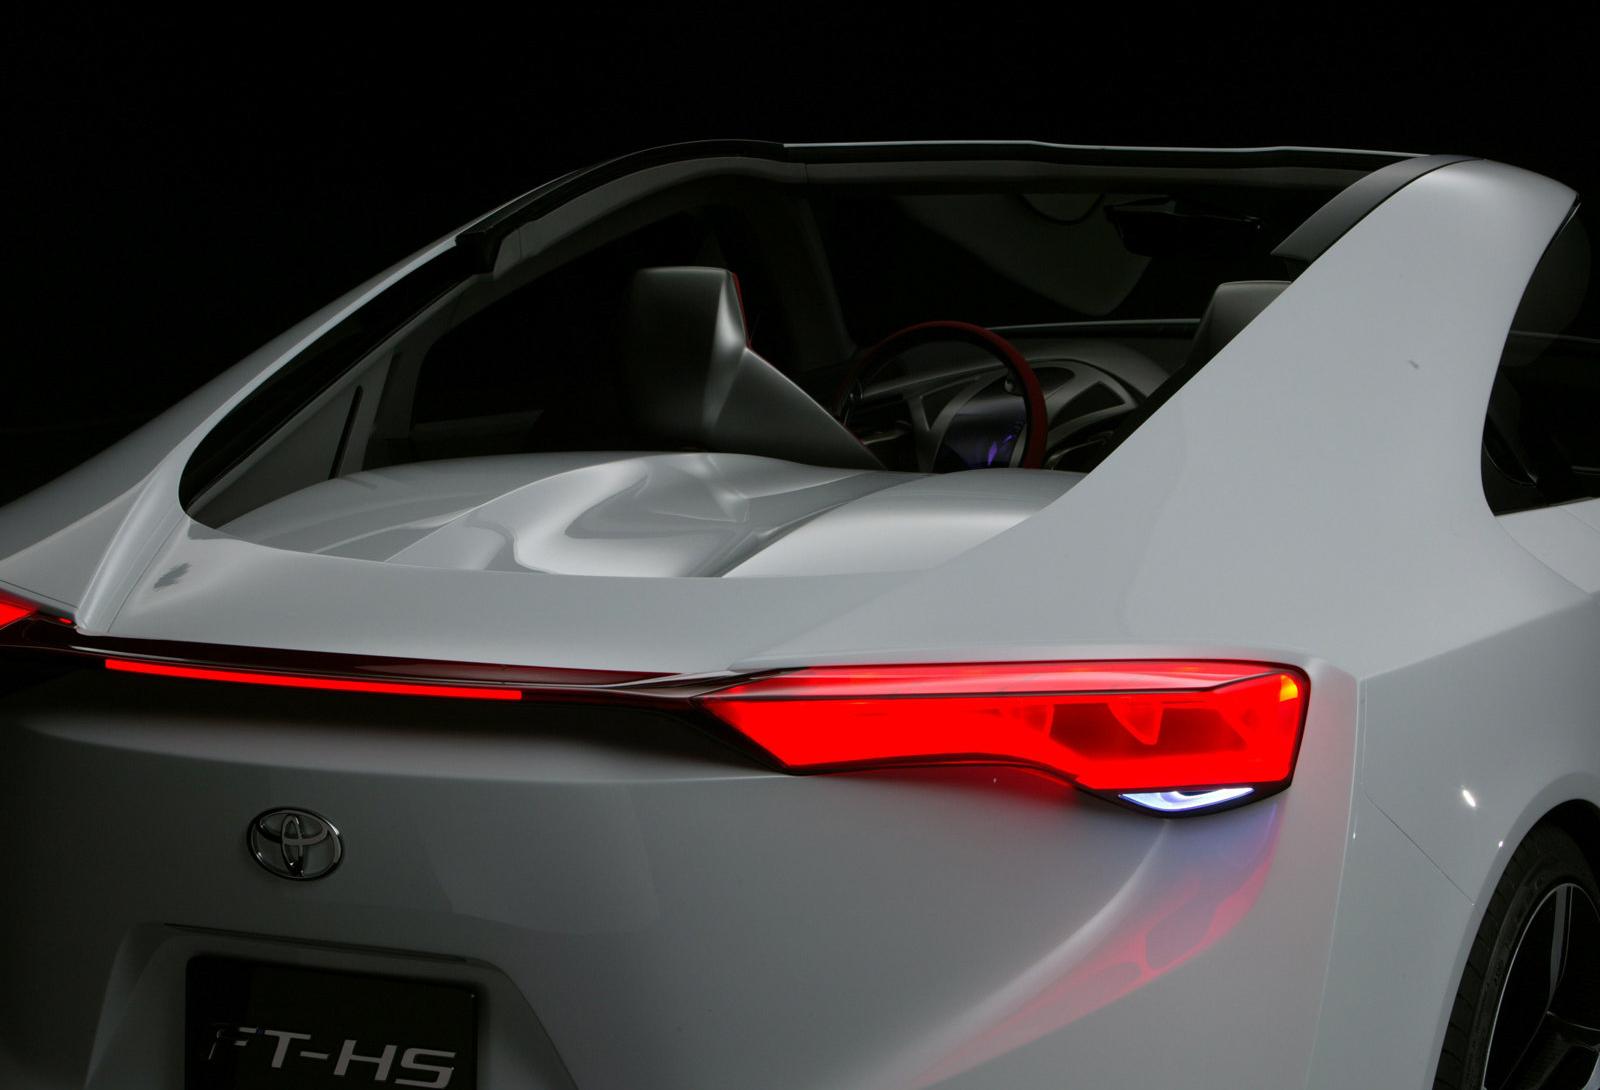 Toyota_FT-HS_concept_0062